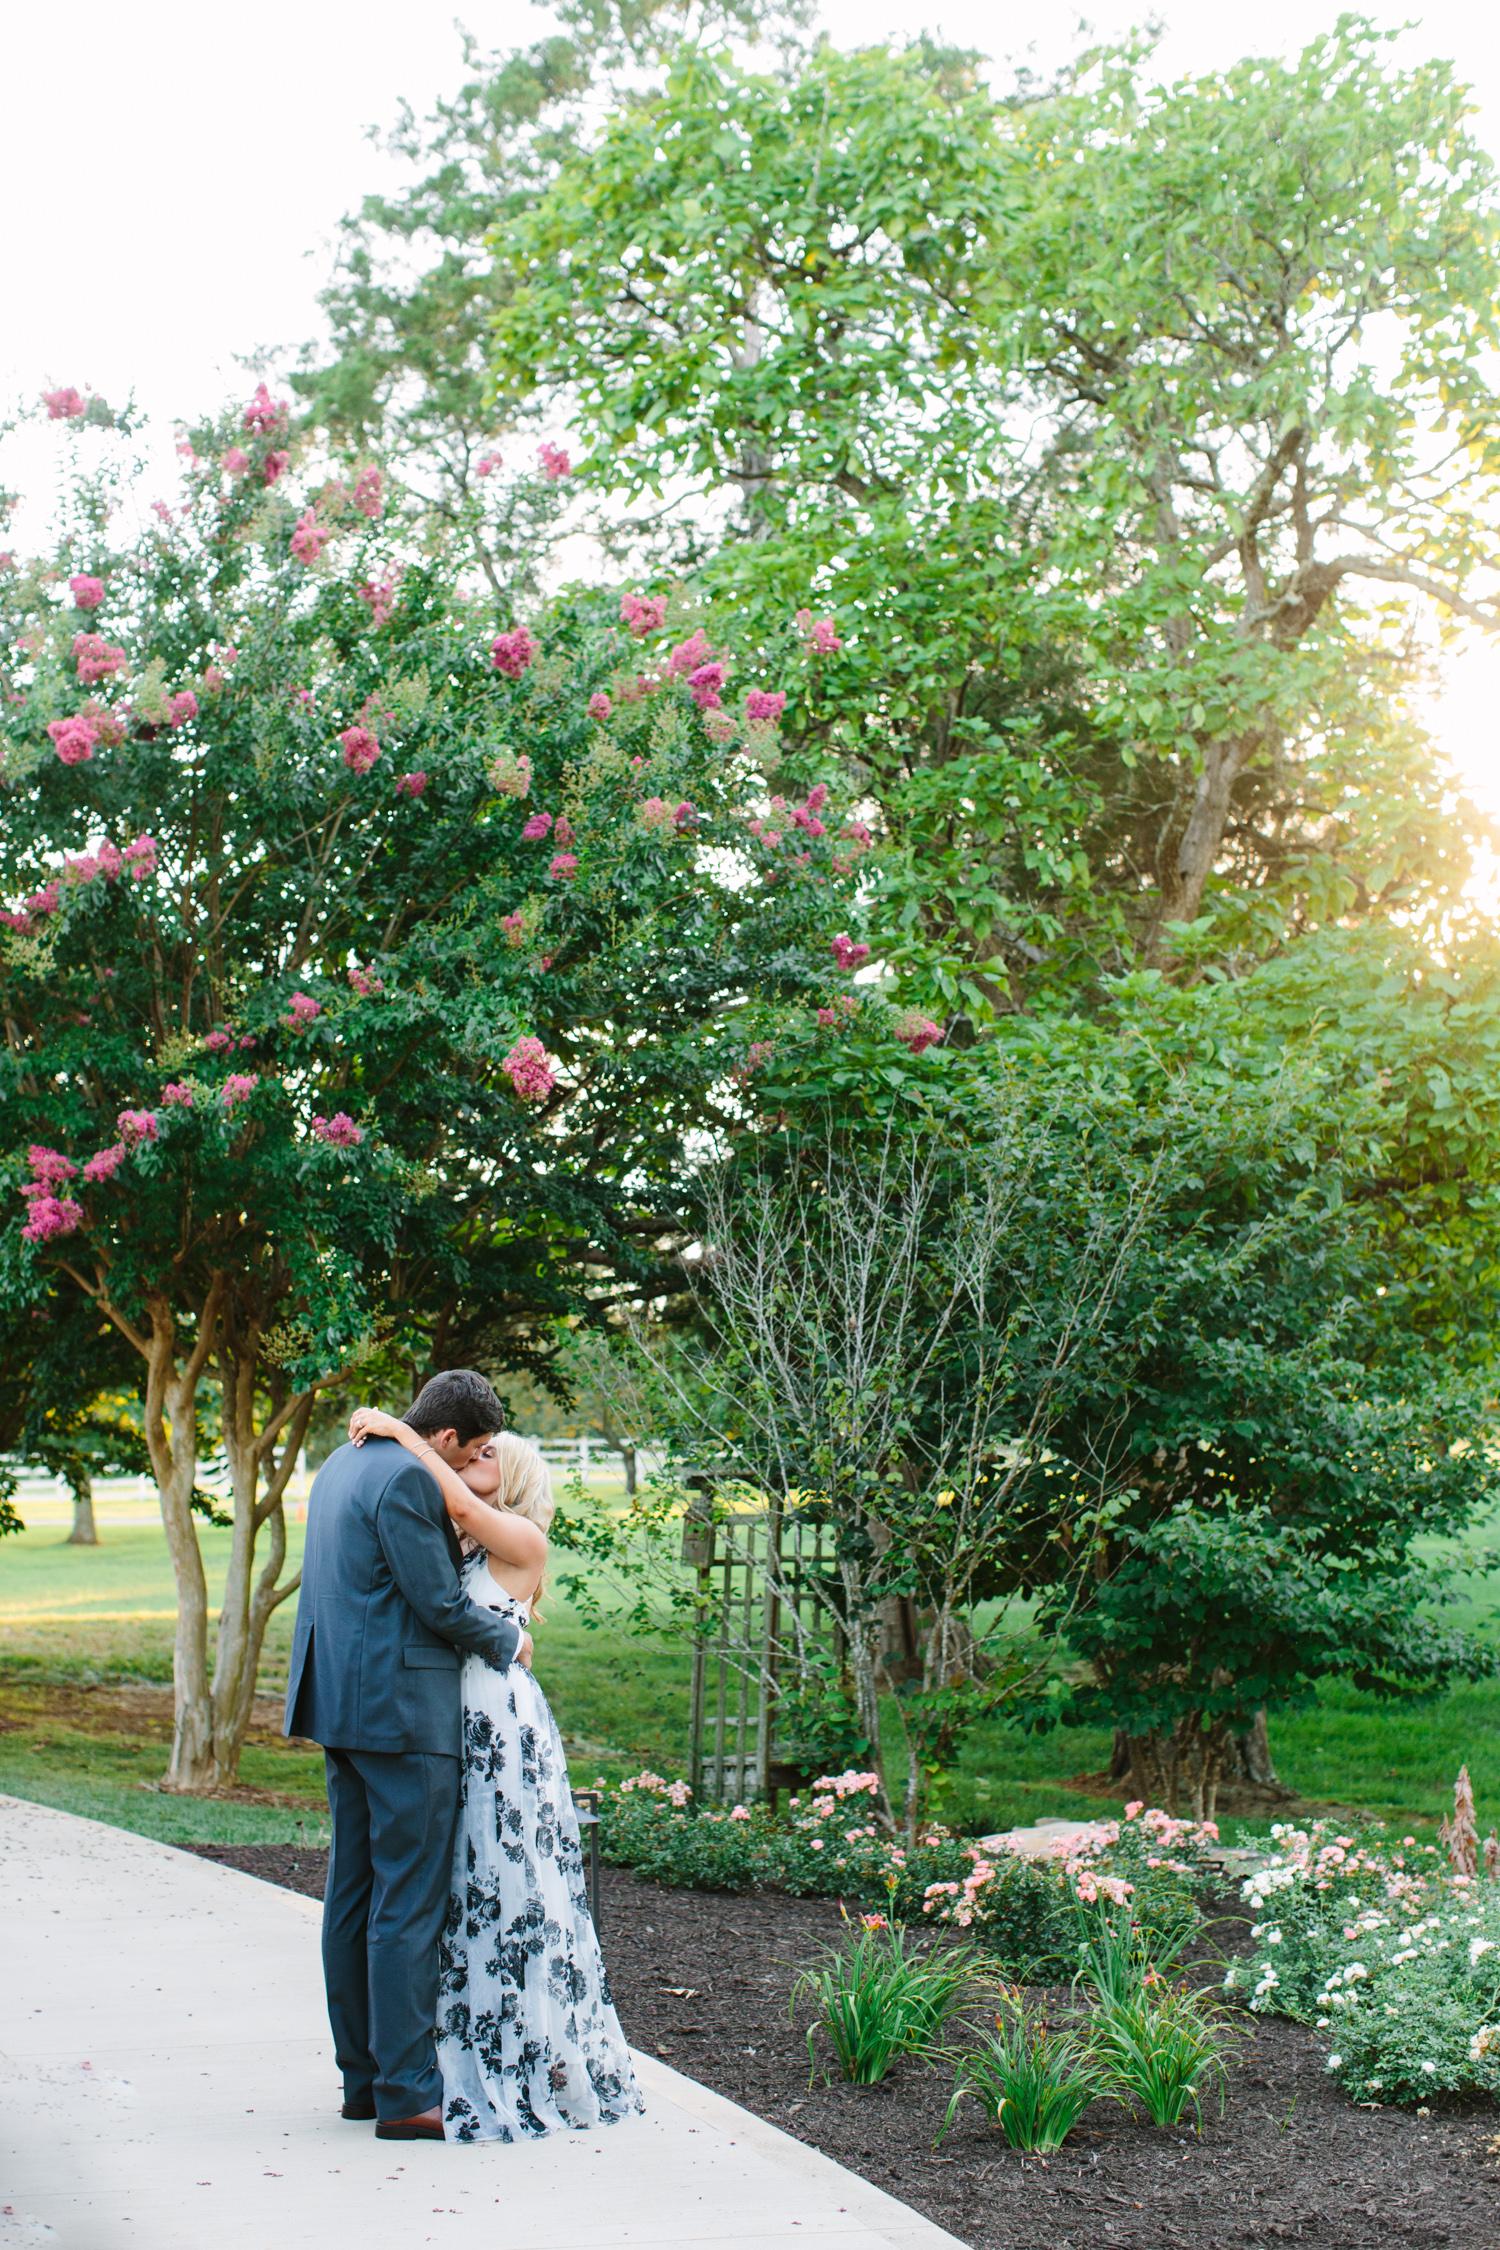 Garden Engagement Photos // Knoxville Photographer // Suzy Collins Photography